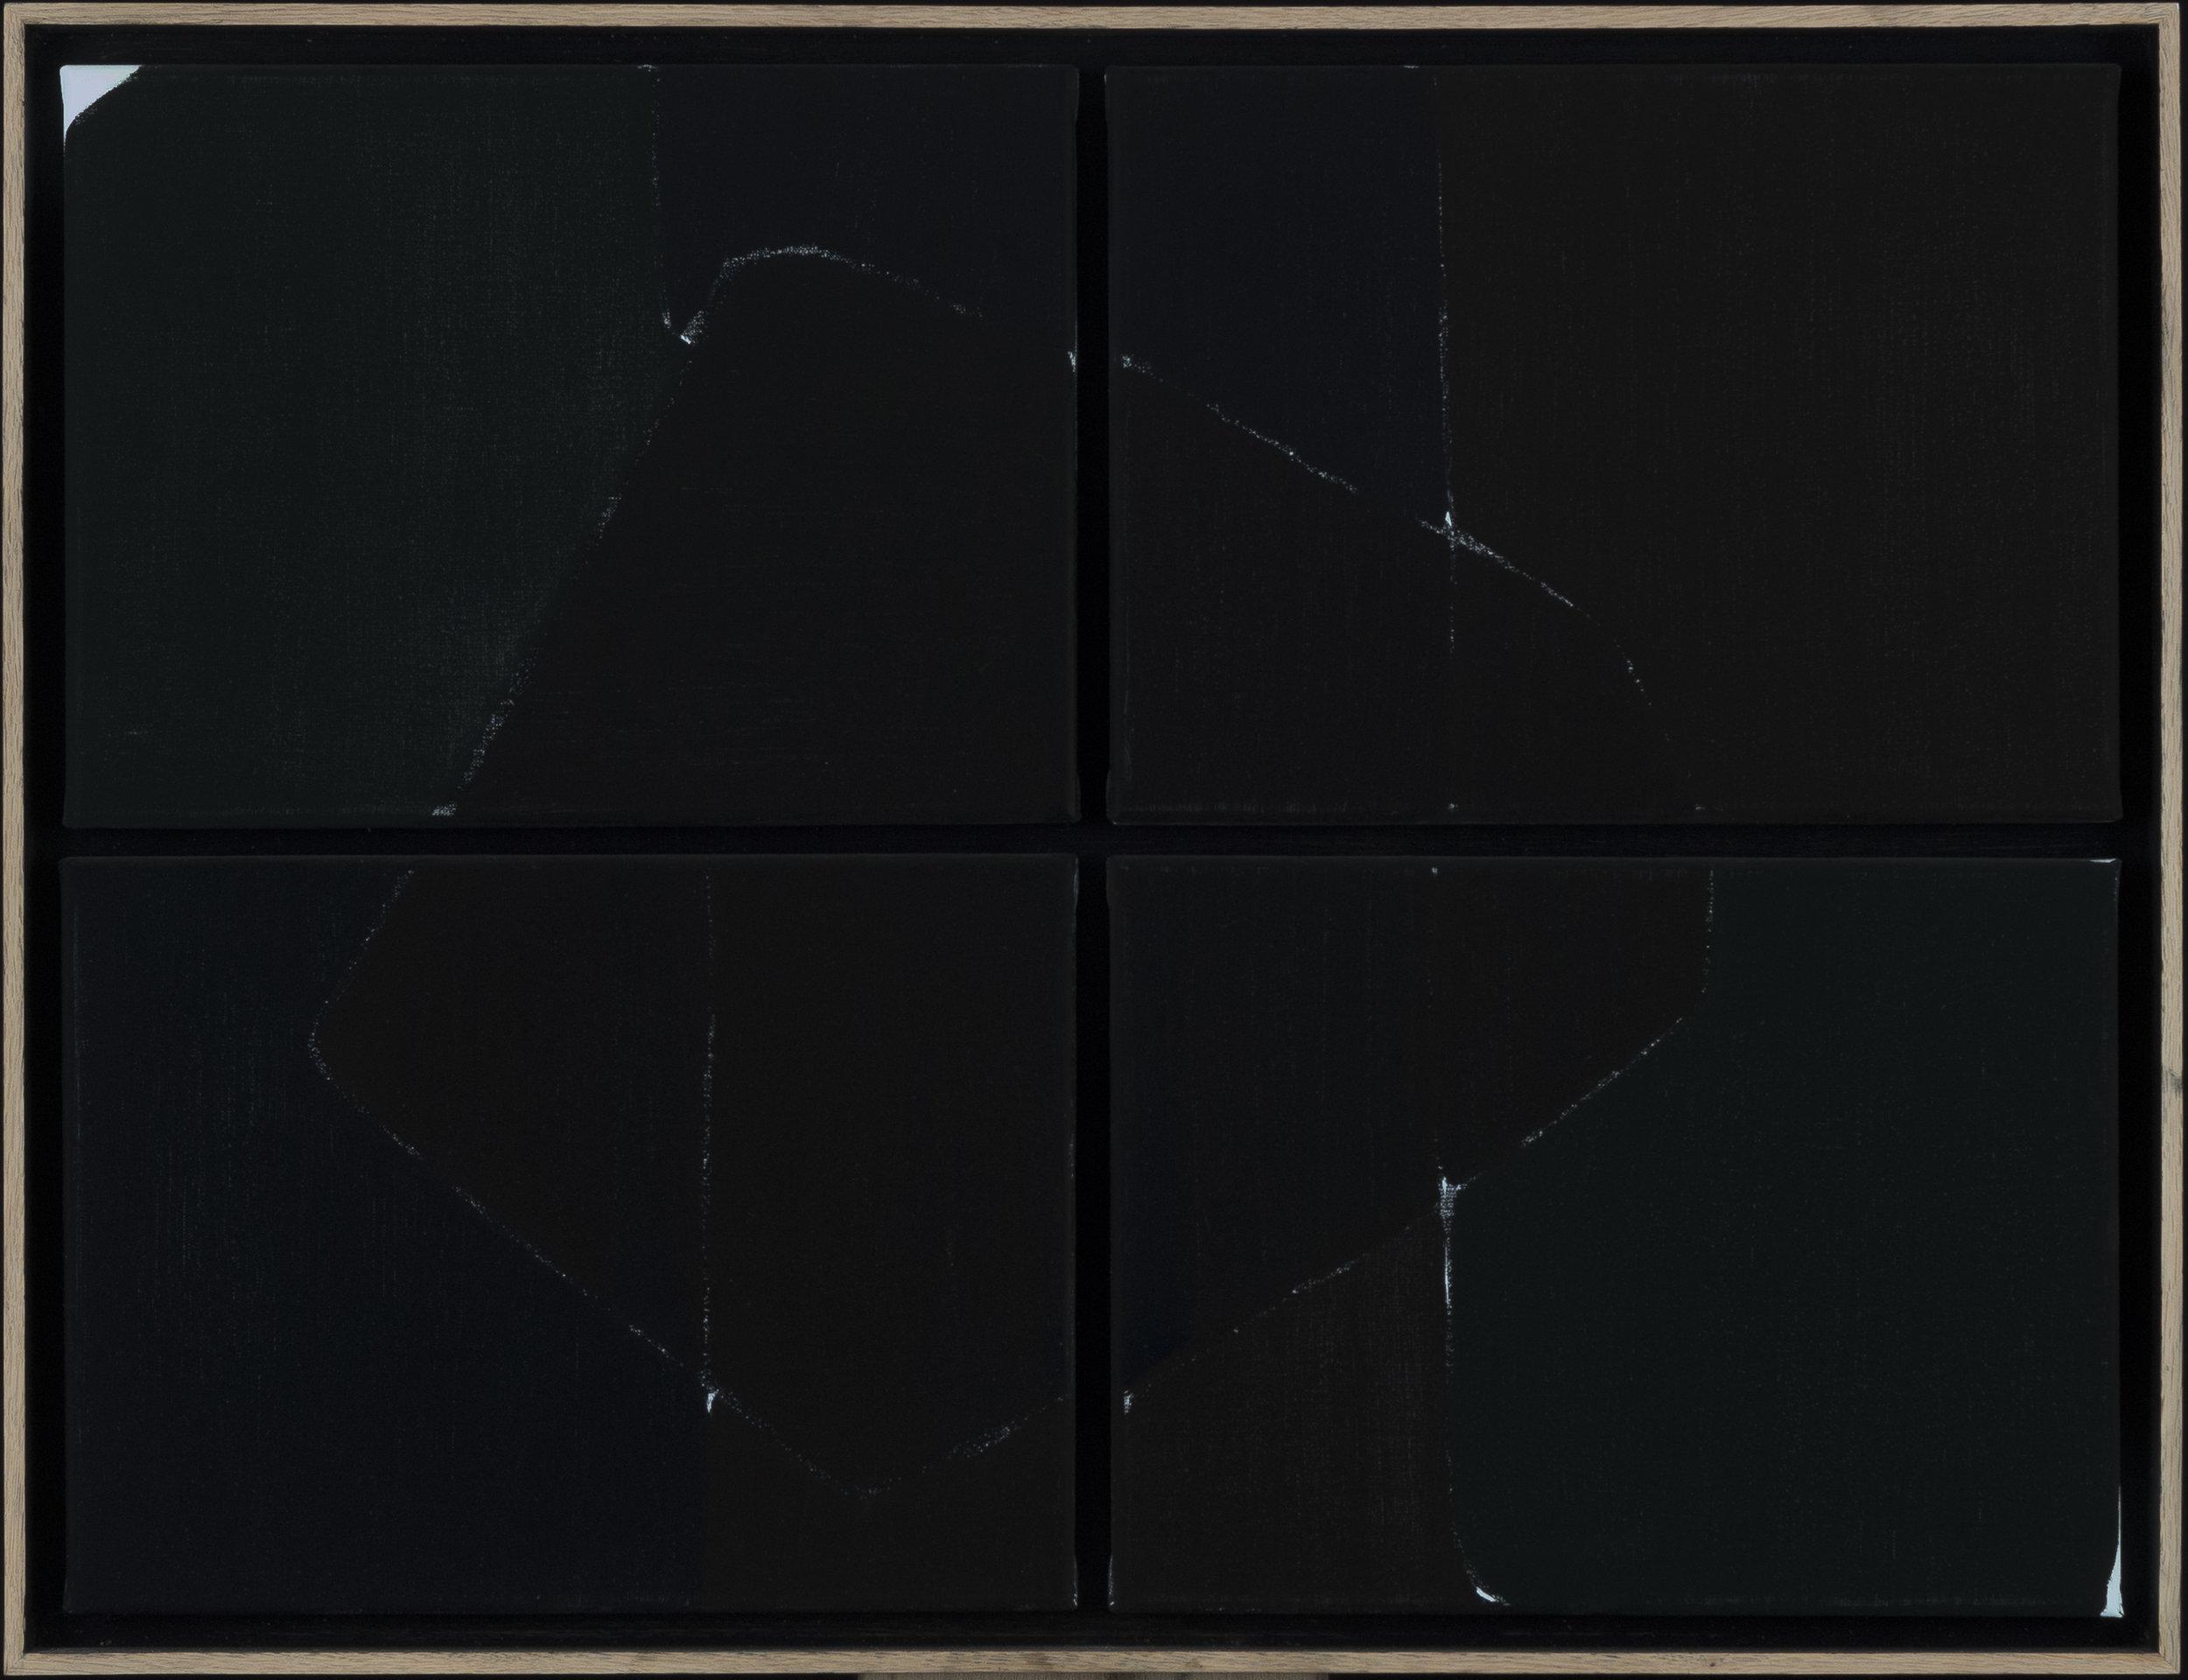 2018, 66x86cm, oil on canvas